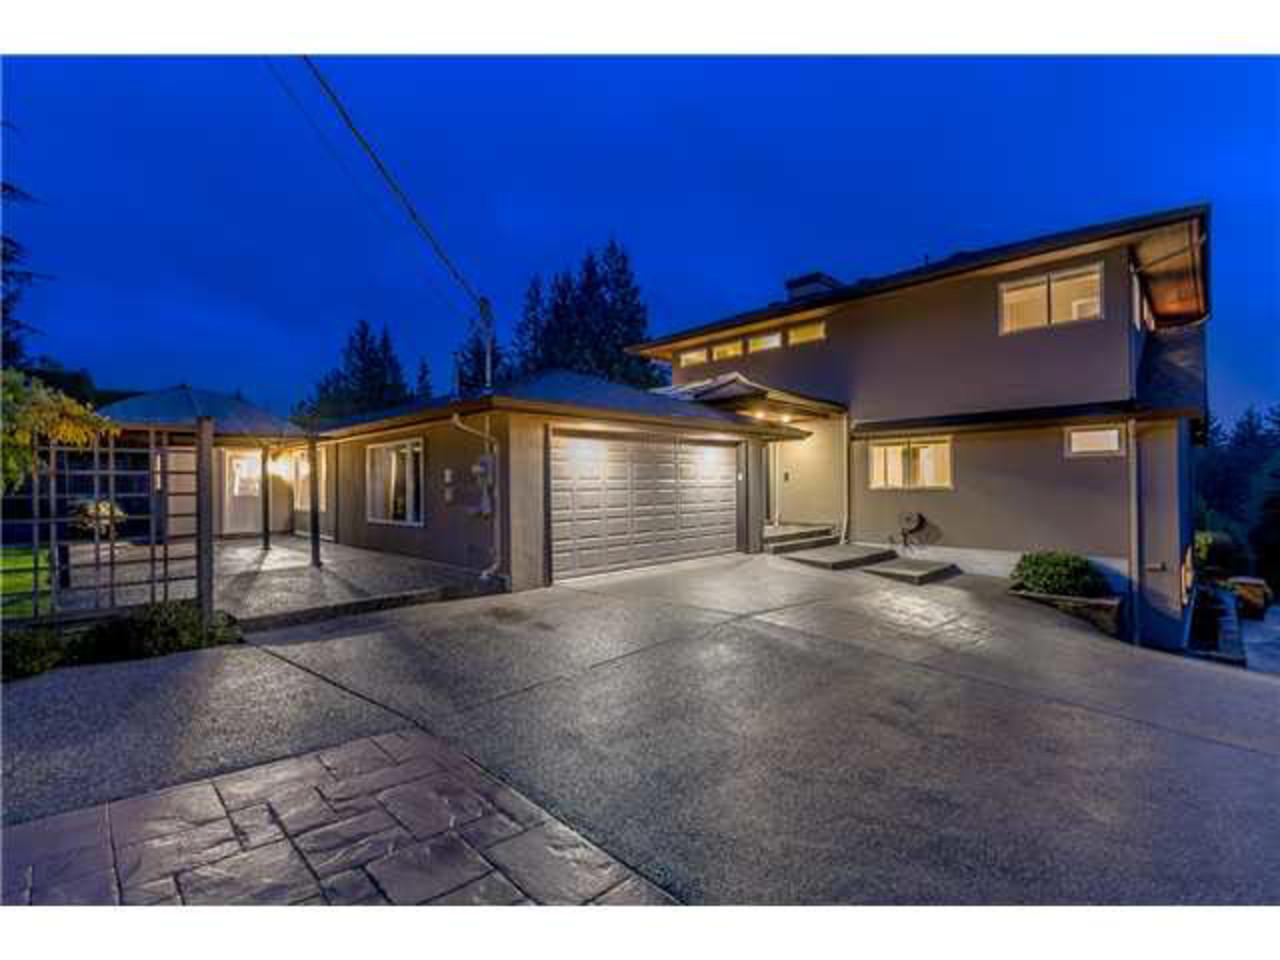 Kenwood at 661 Kenwood, British Properties, West Vancouver